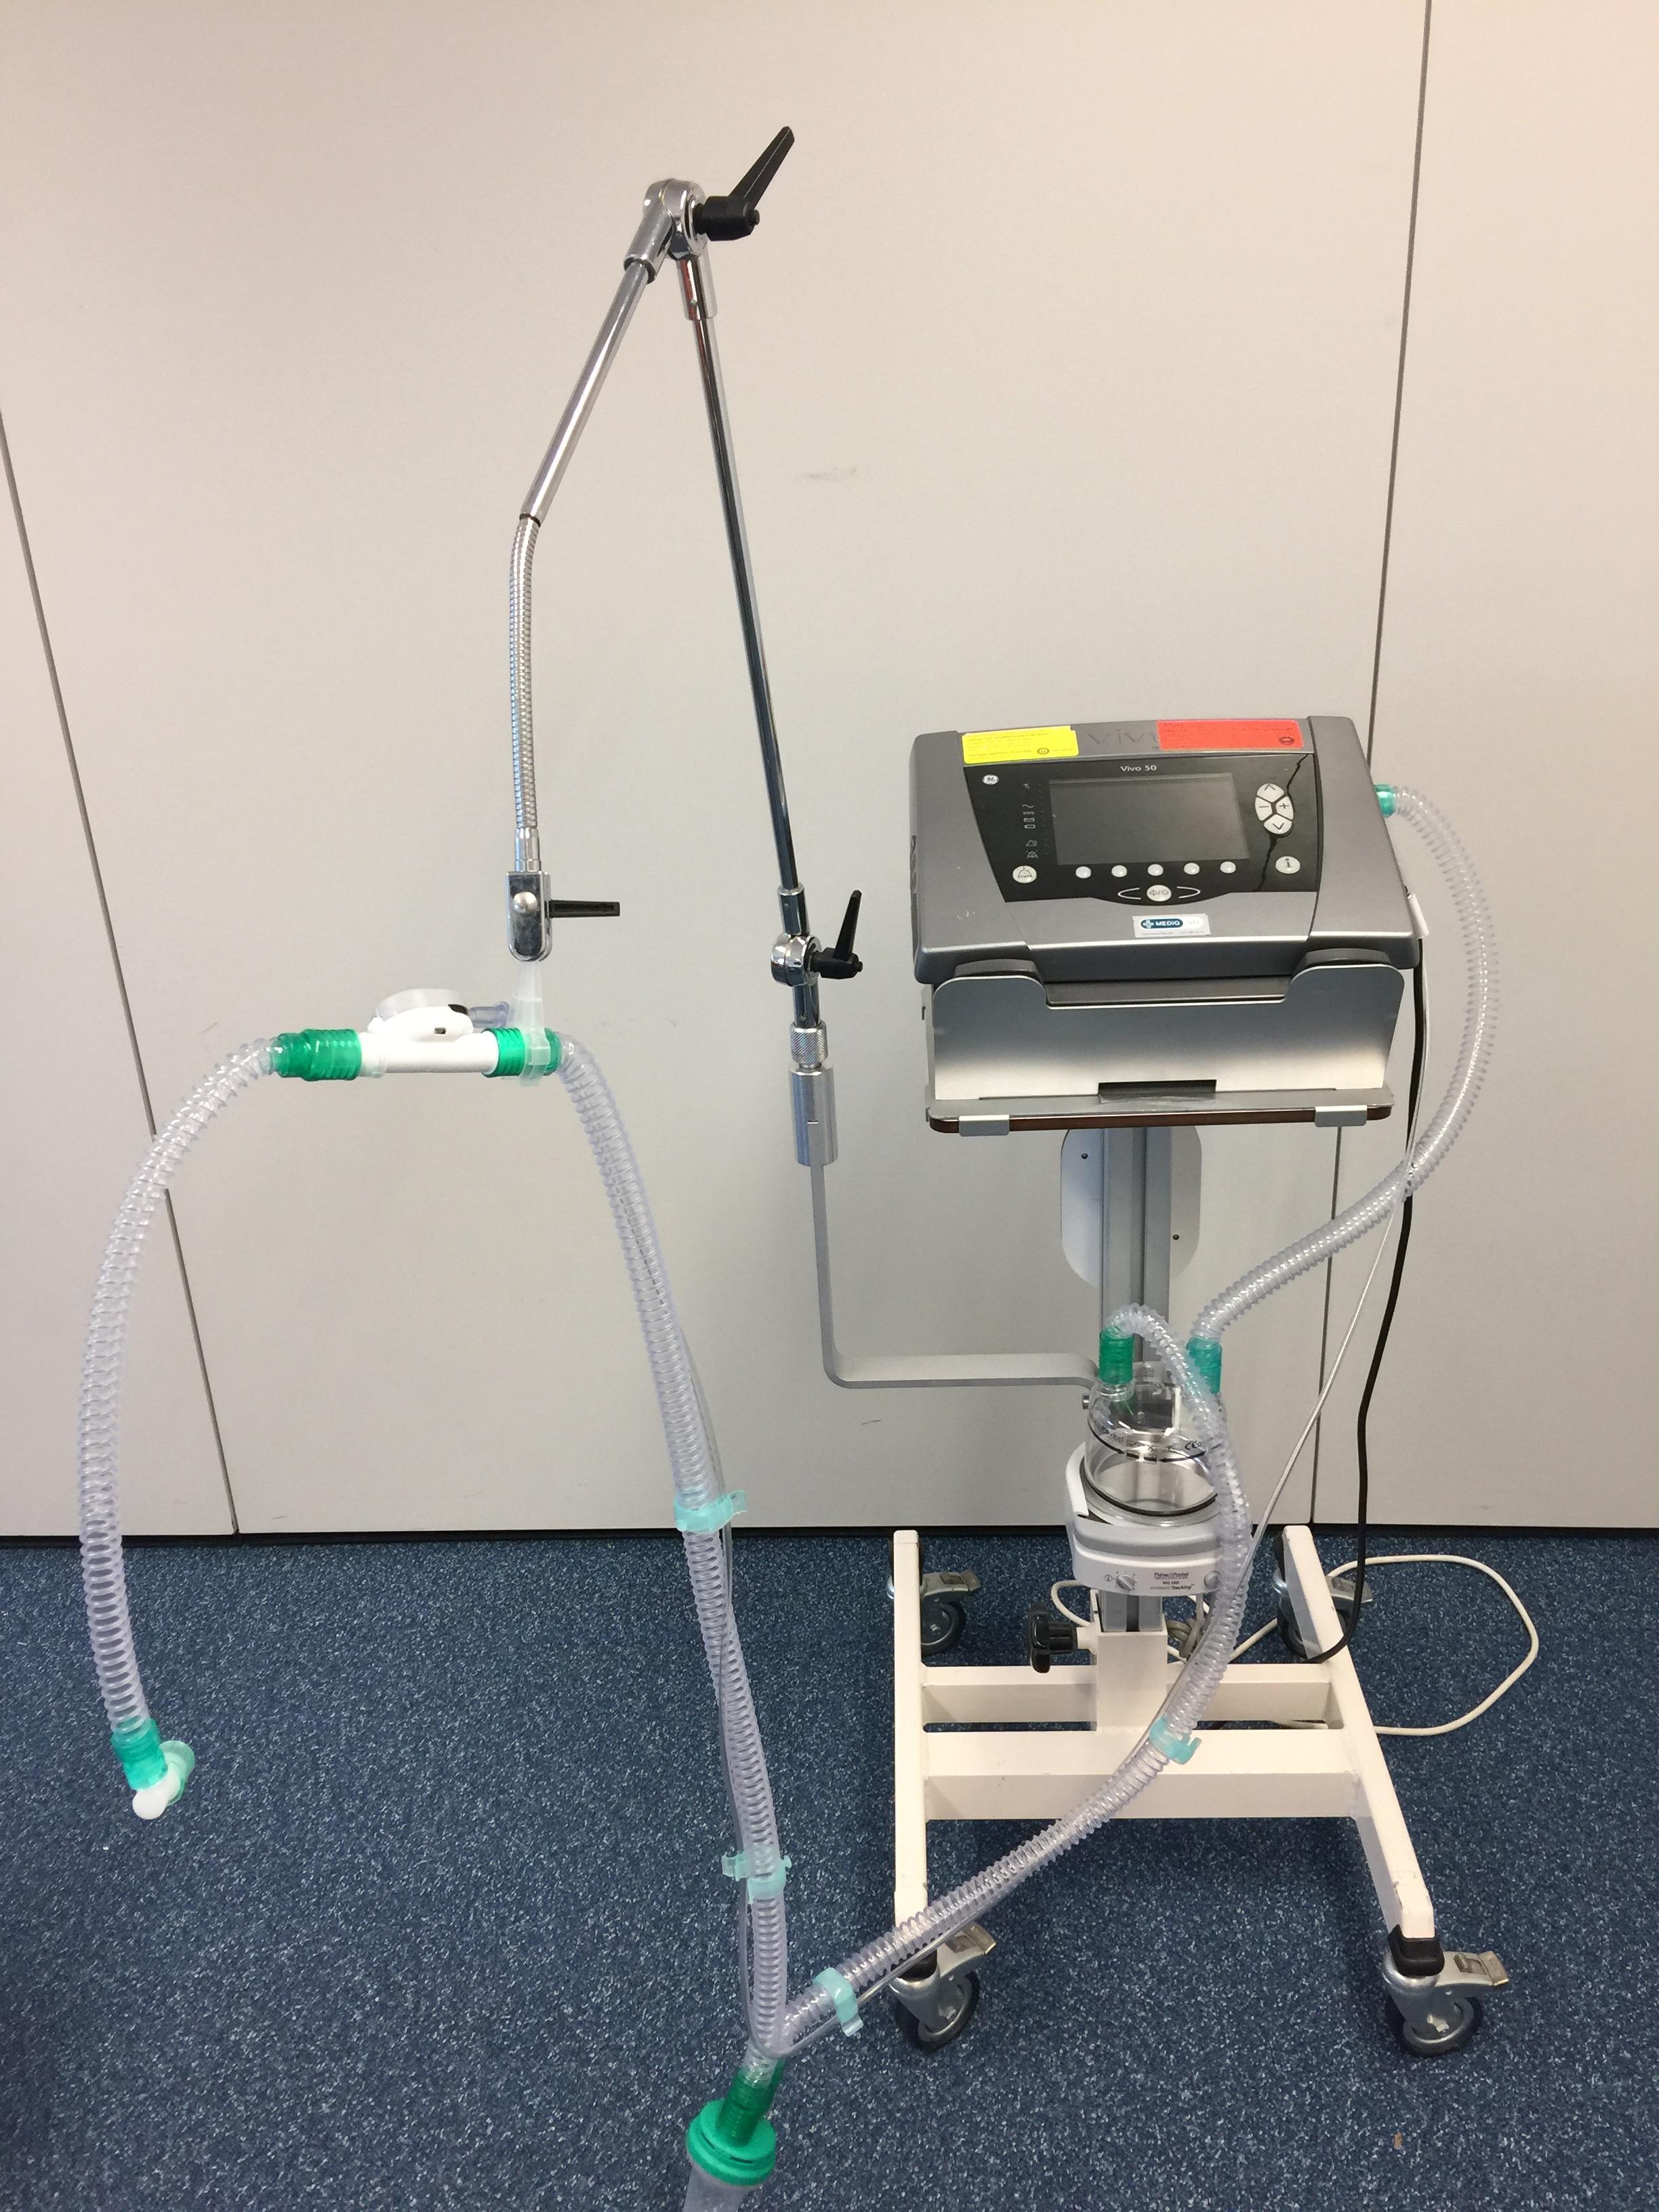 Beademingsapparaat Vivo 50 tracheostomale beademing slangen systeem filter o2 zuurstof nippel bevochtiging pot expiratieklep klep